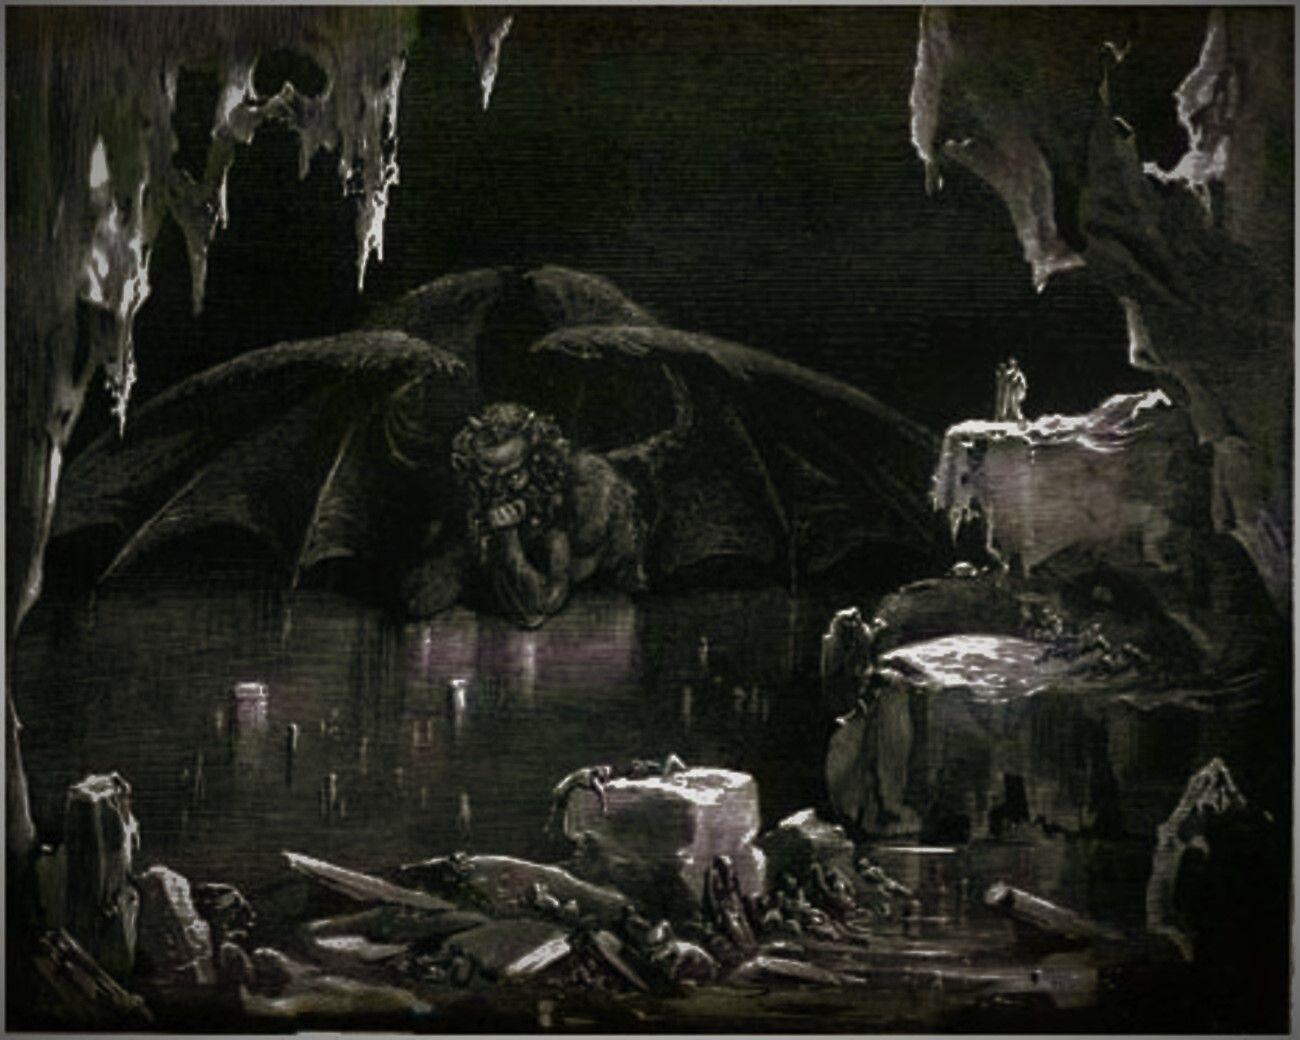 Fig. 4 Gustave Doré, Raffigurazione di Lucifero, 1860 64